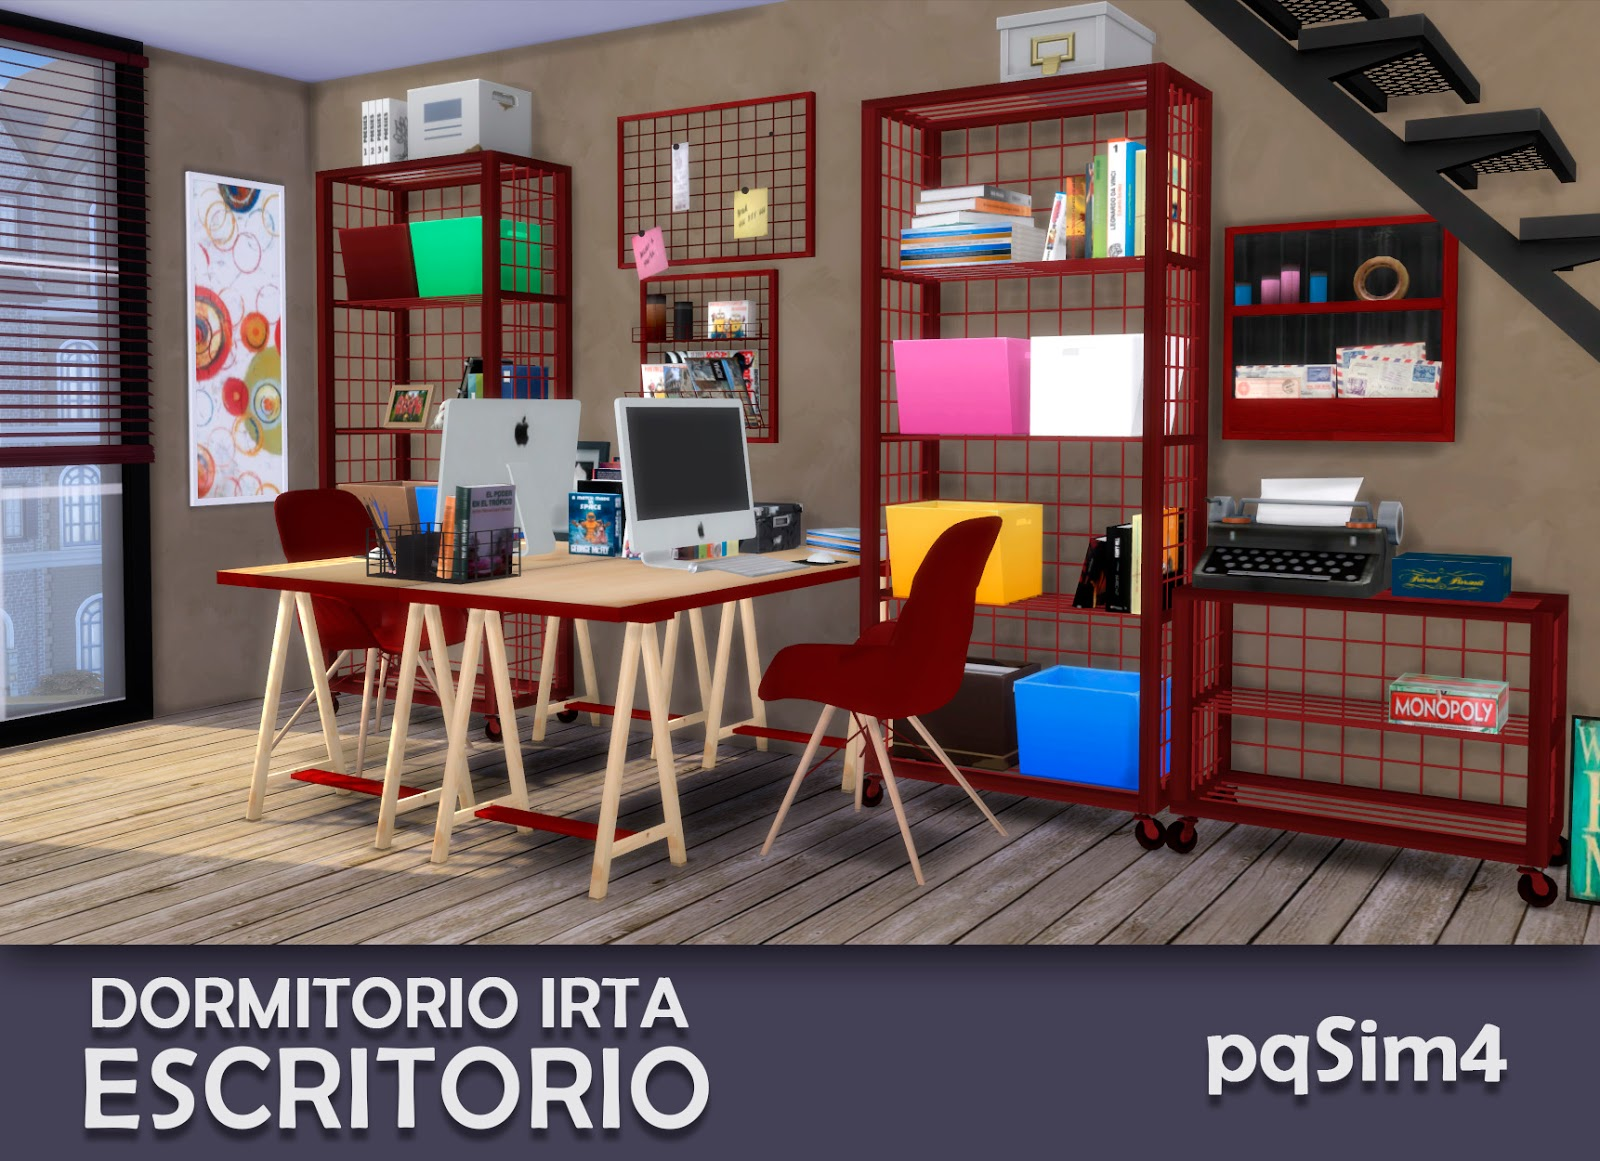 Dormitorio irta set 2 escritorio sims 4 custom content - Escritorio dormitorio ...